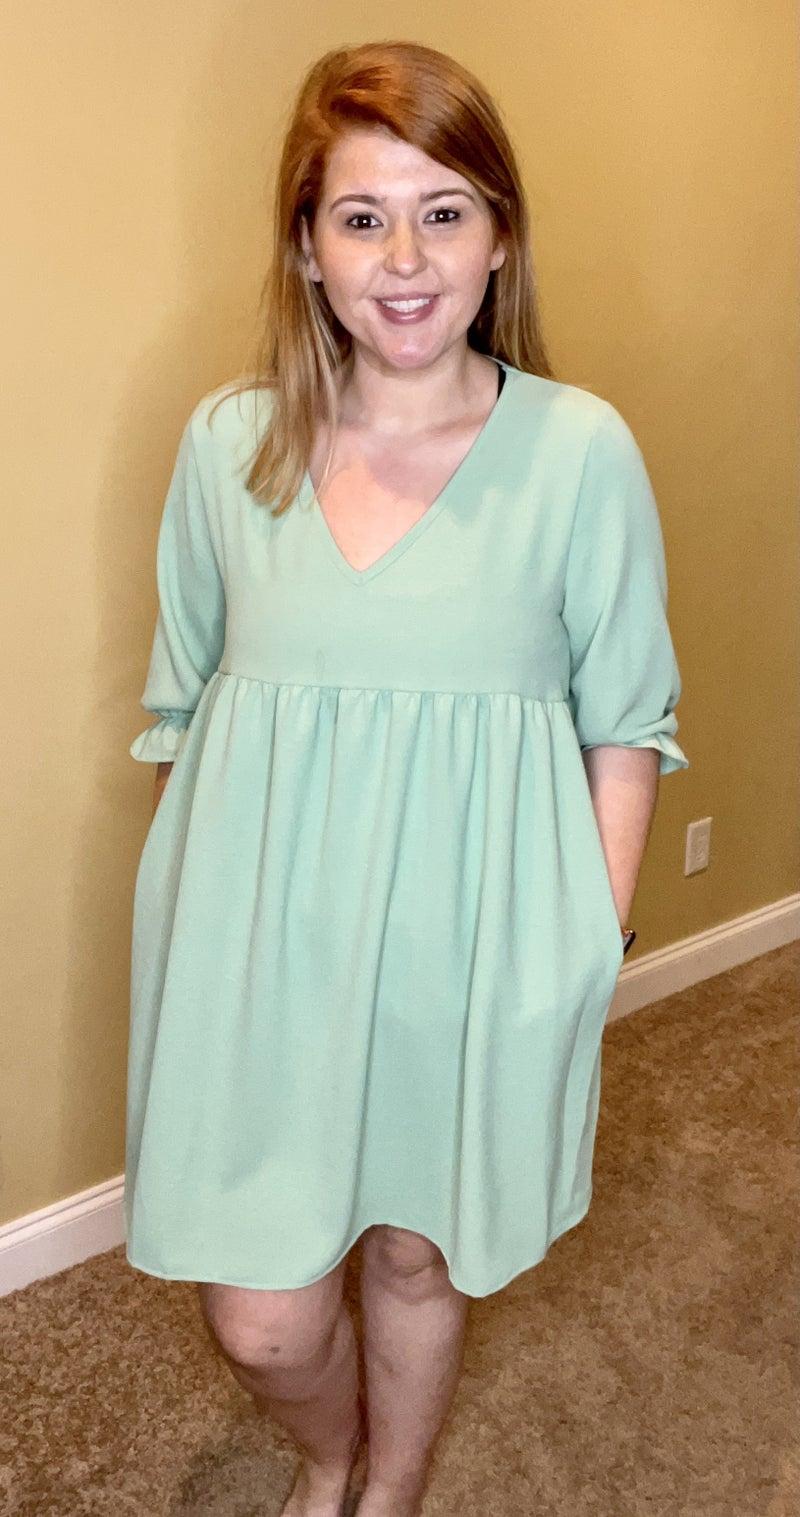 Feel The Breeze Dress,Mint